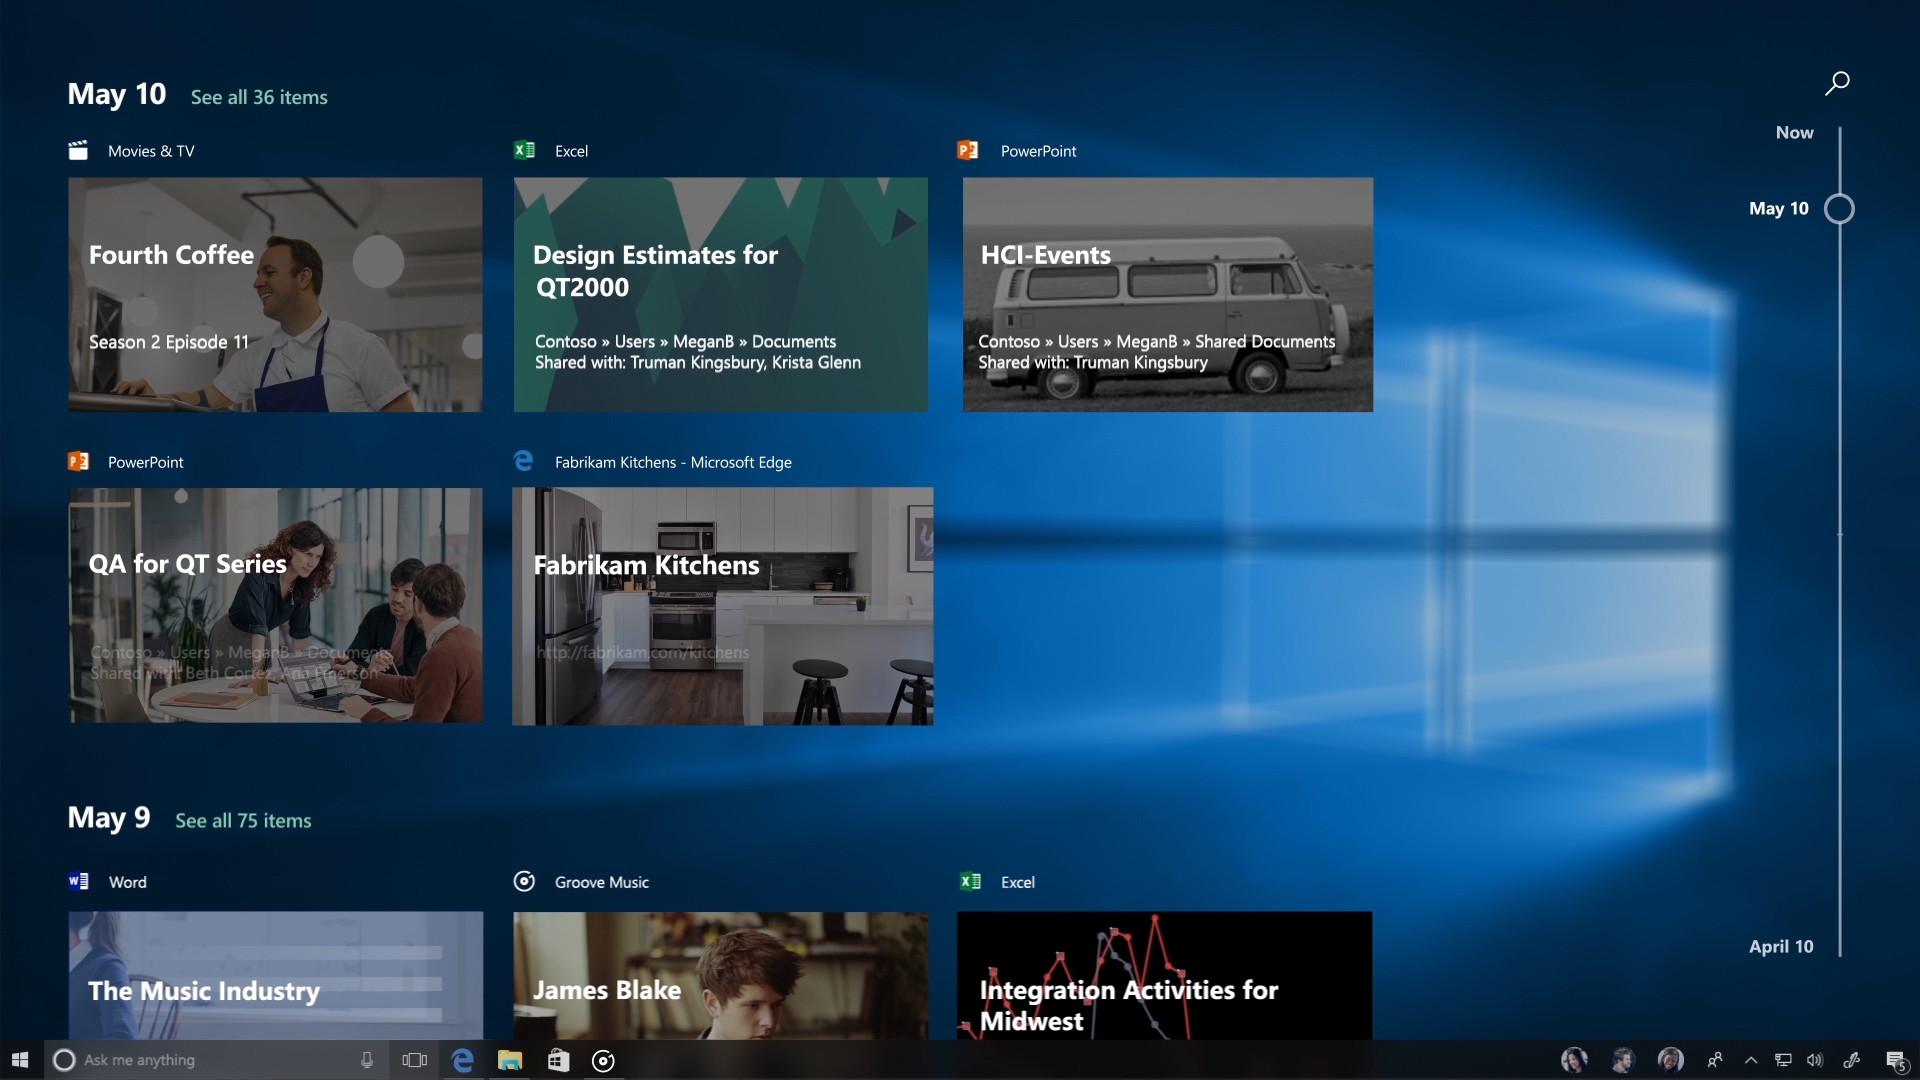 Windows 10 update aims to help identify best photos, videos